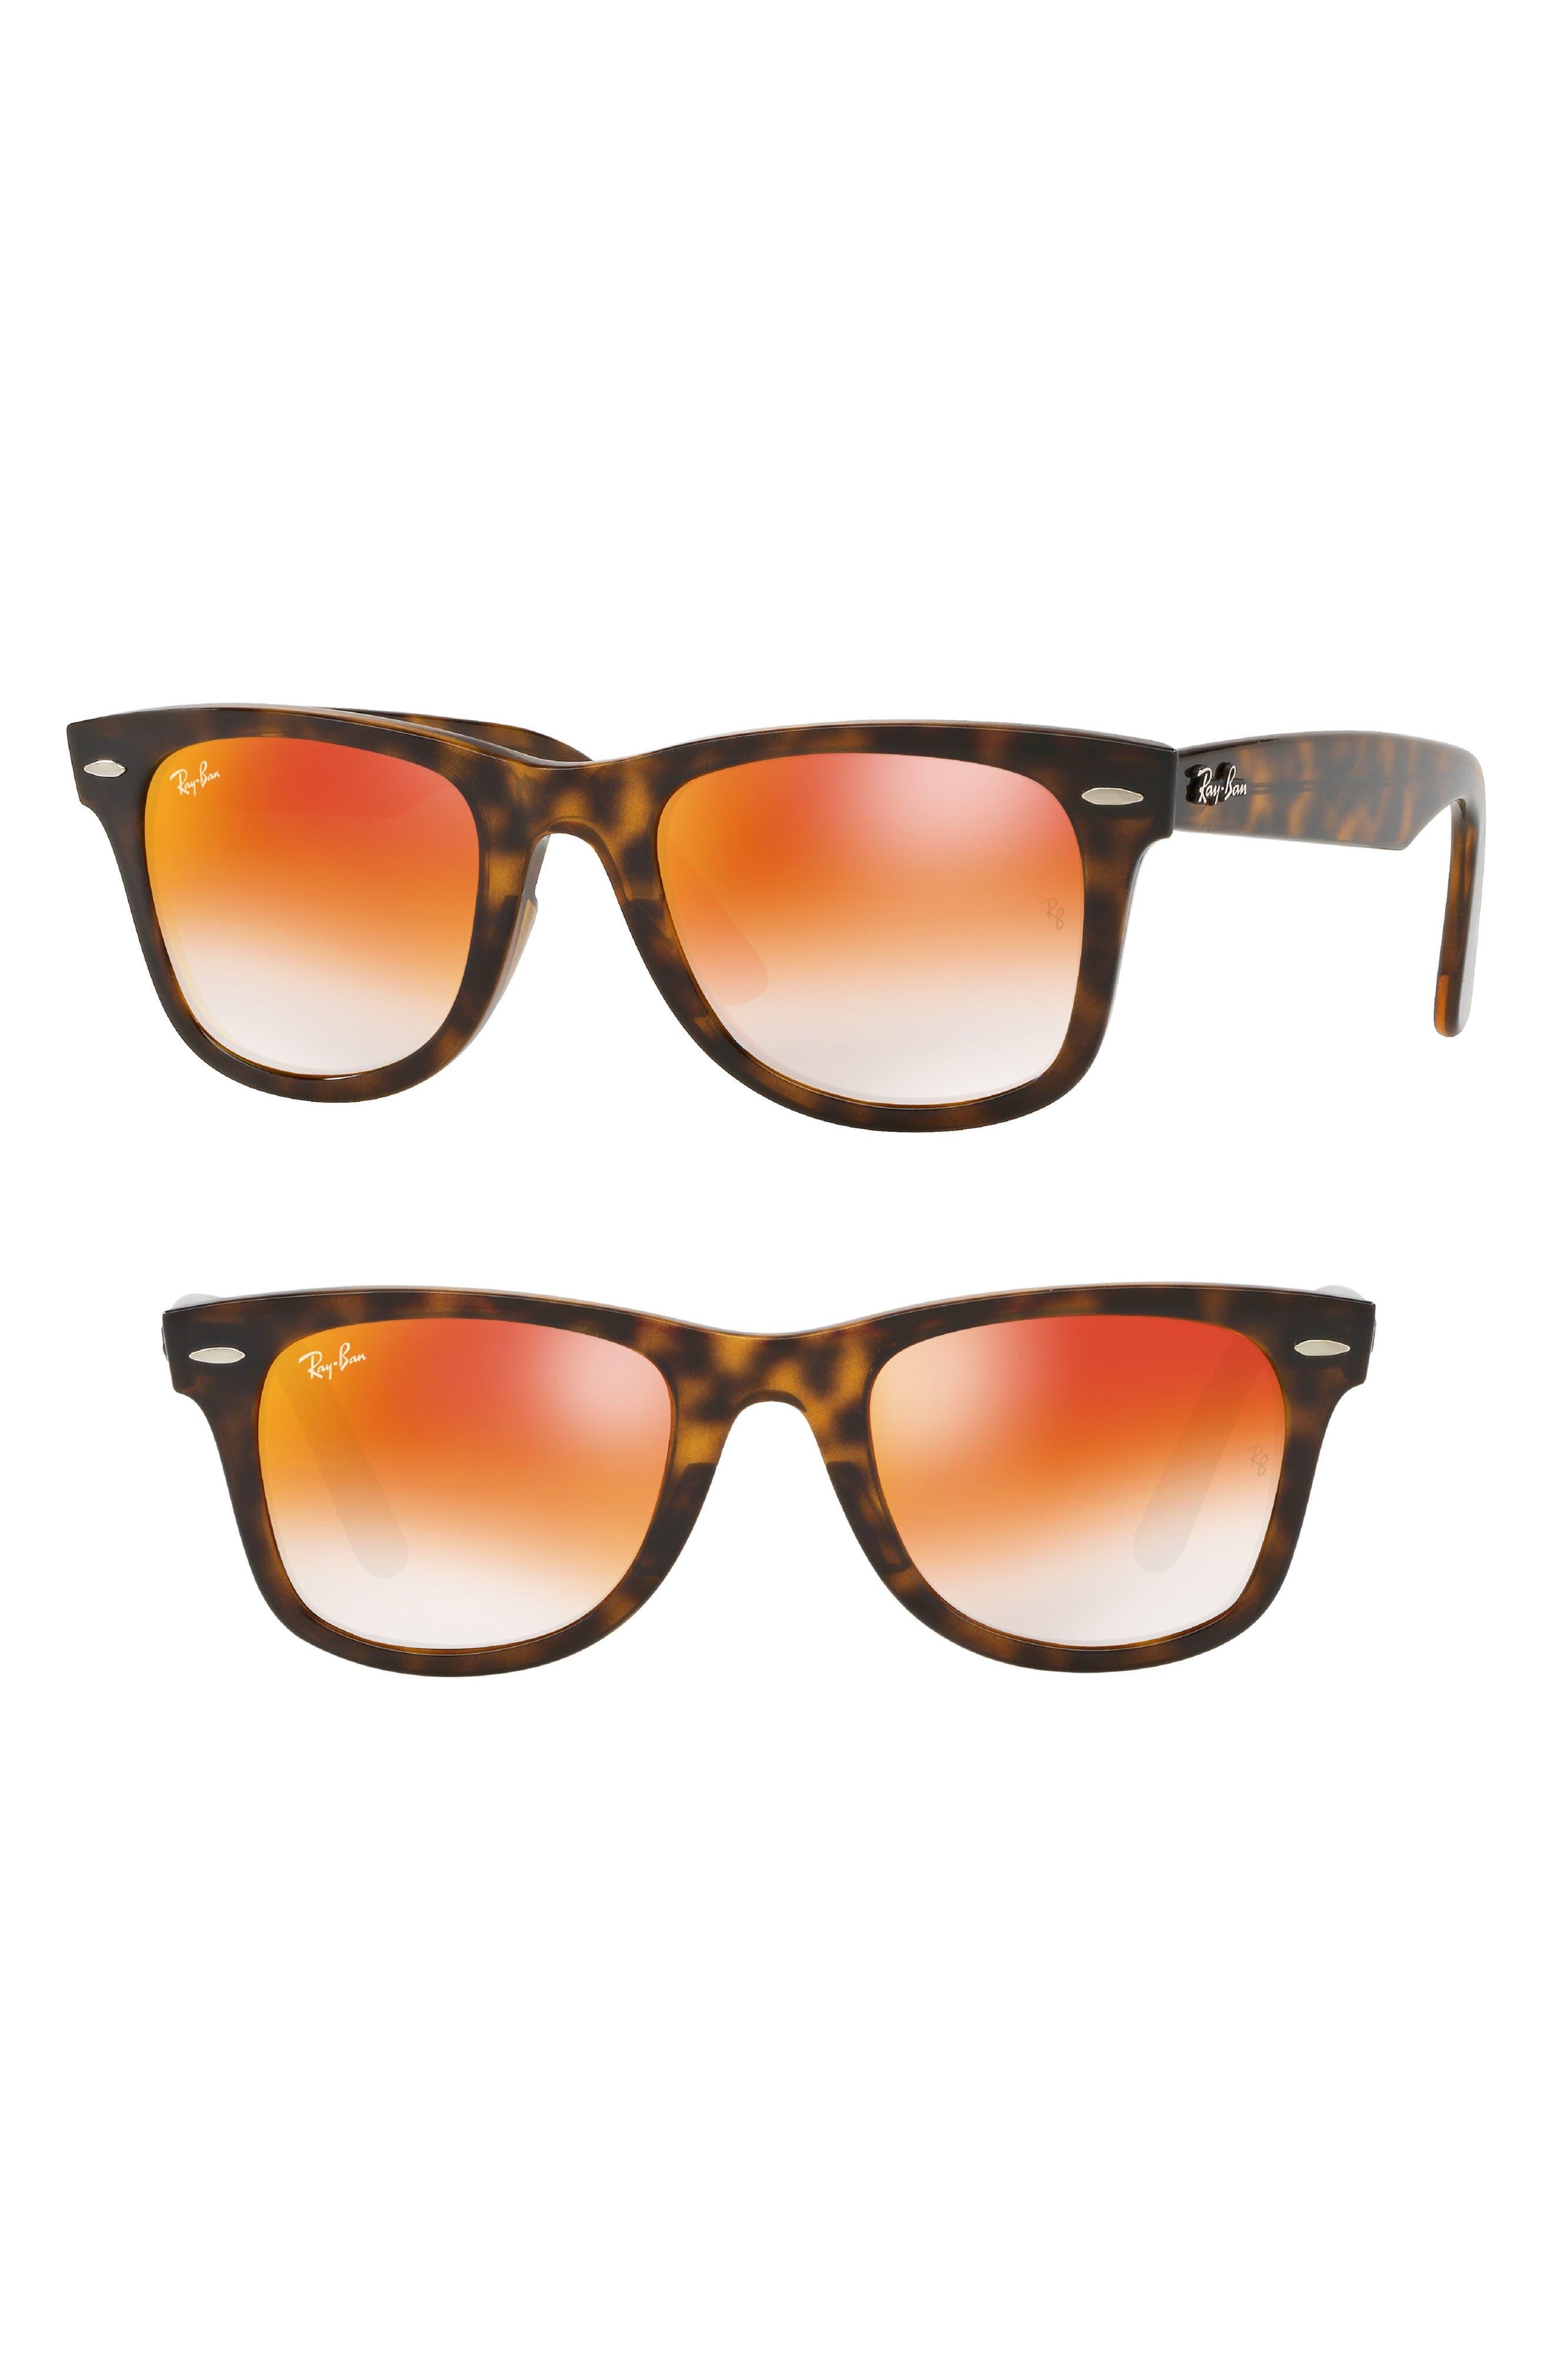 Ray-Ban Wayfarer 50mm Mirrored Sunglasses